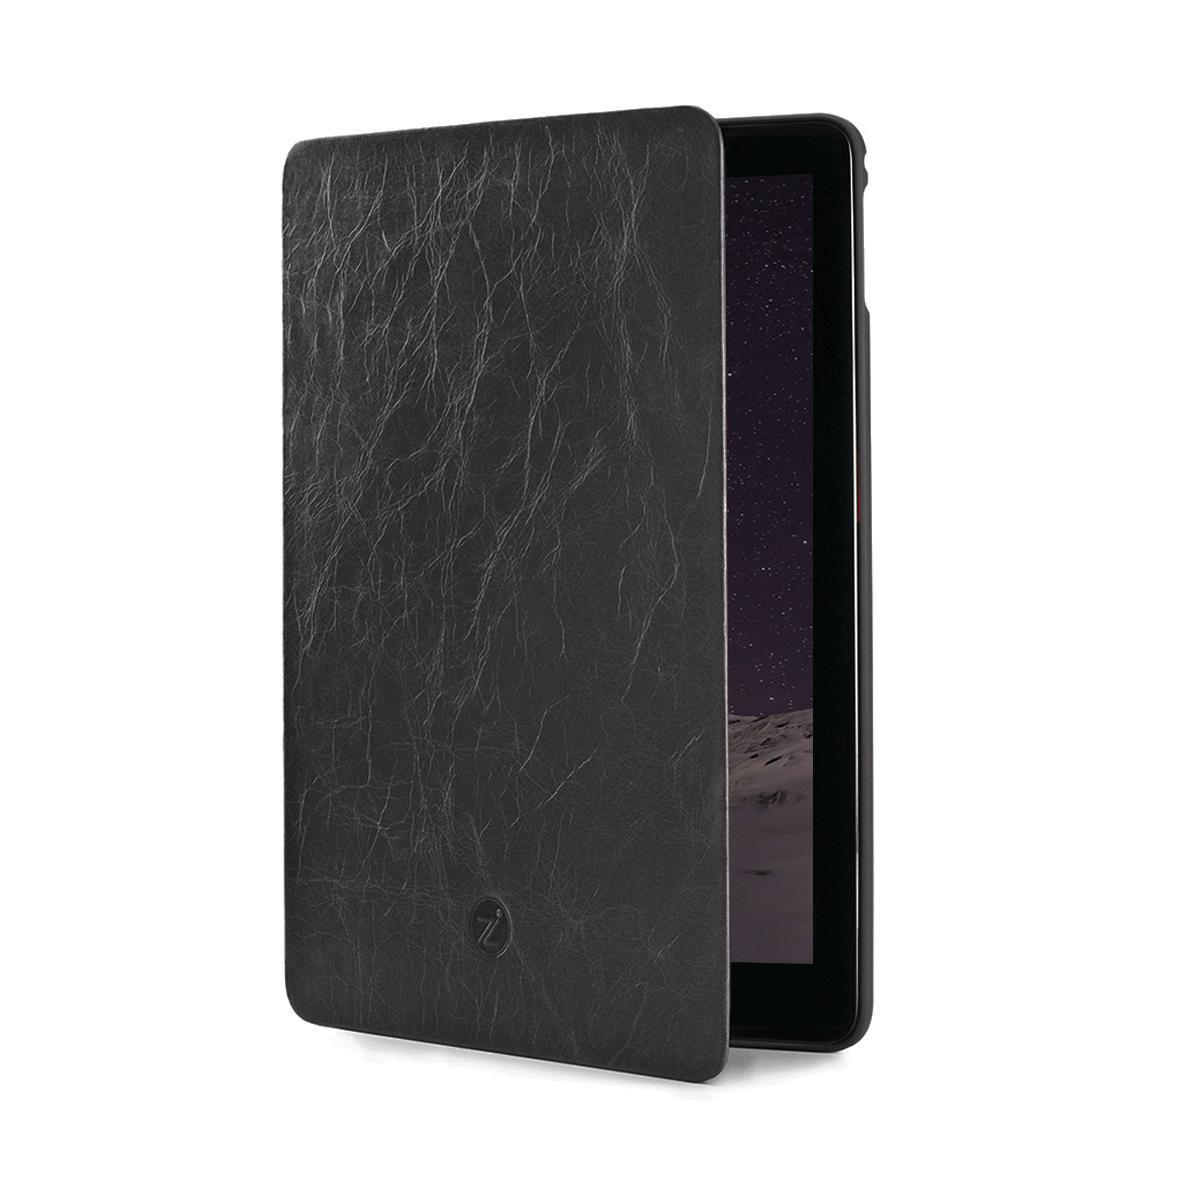 Чехол книжка Cozistyle Leather Smart Shell для Apple iPad Air (черный)